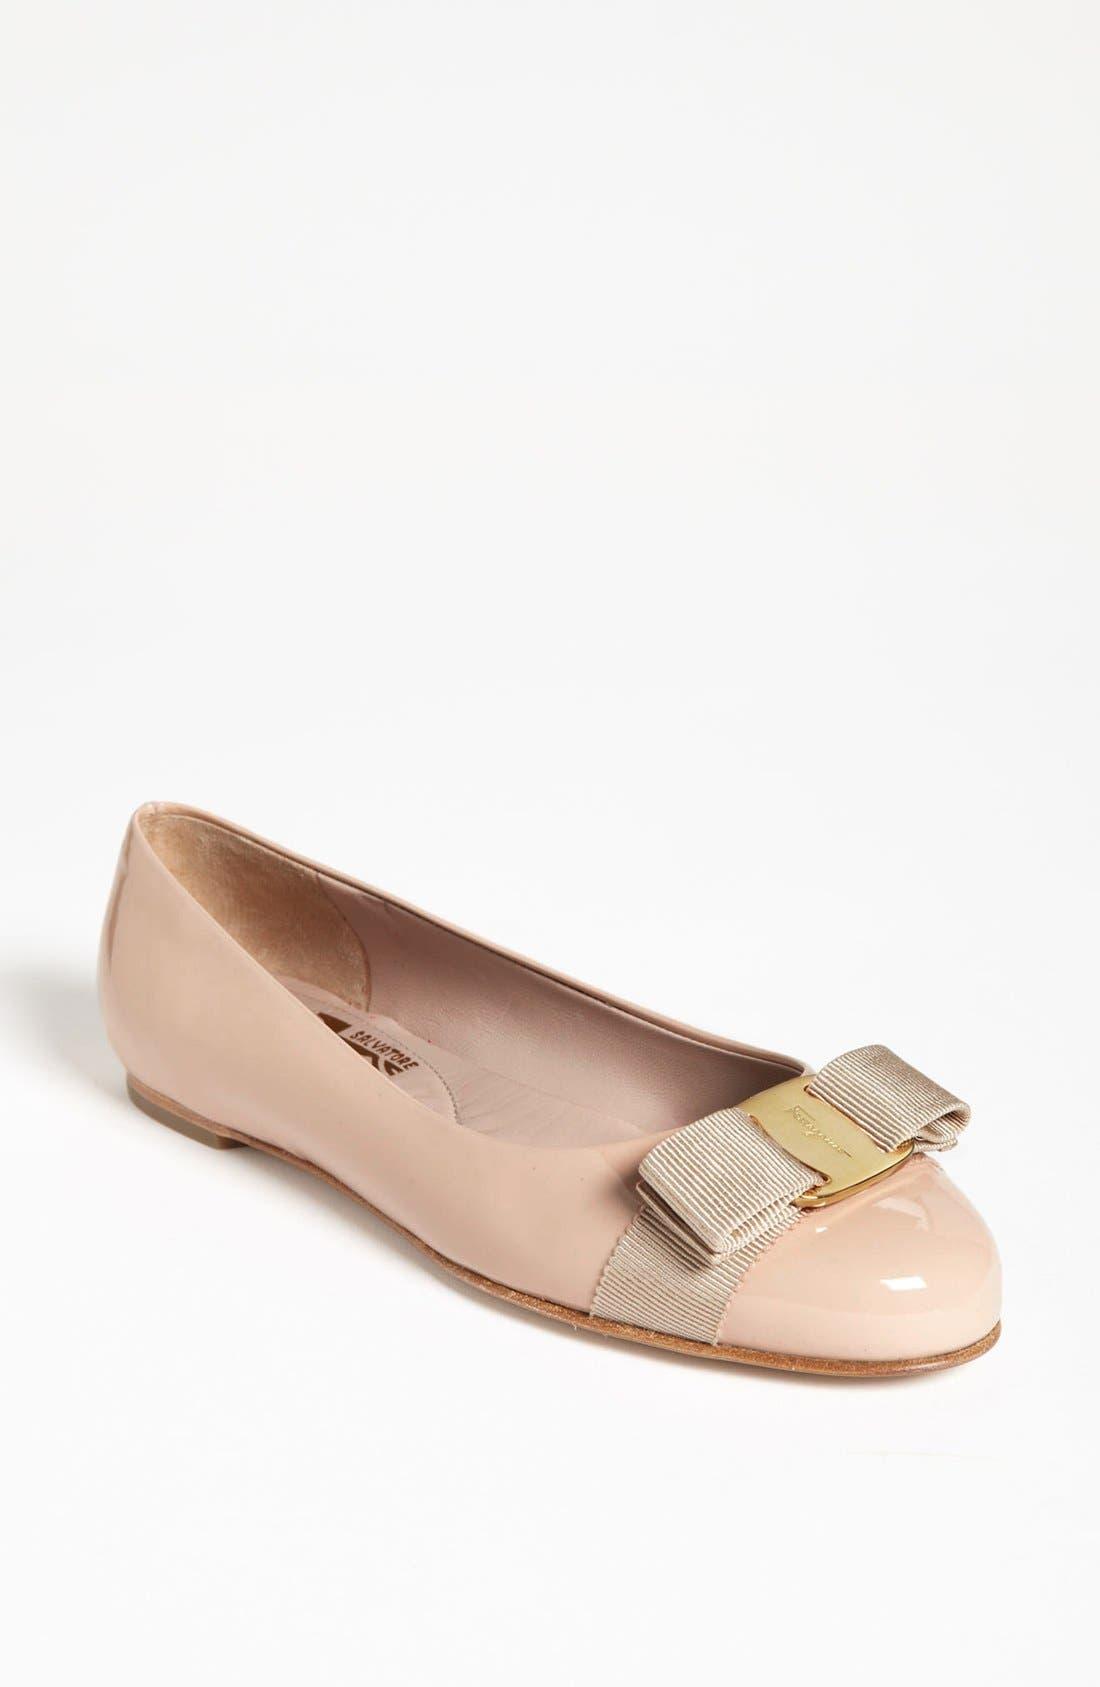 Main Image - Salvatore Ferragamo Varina Leather Flat (Women)